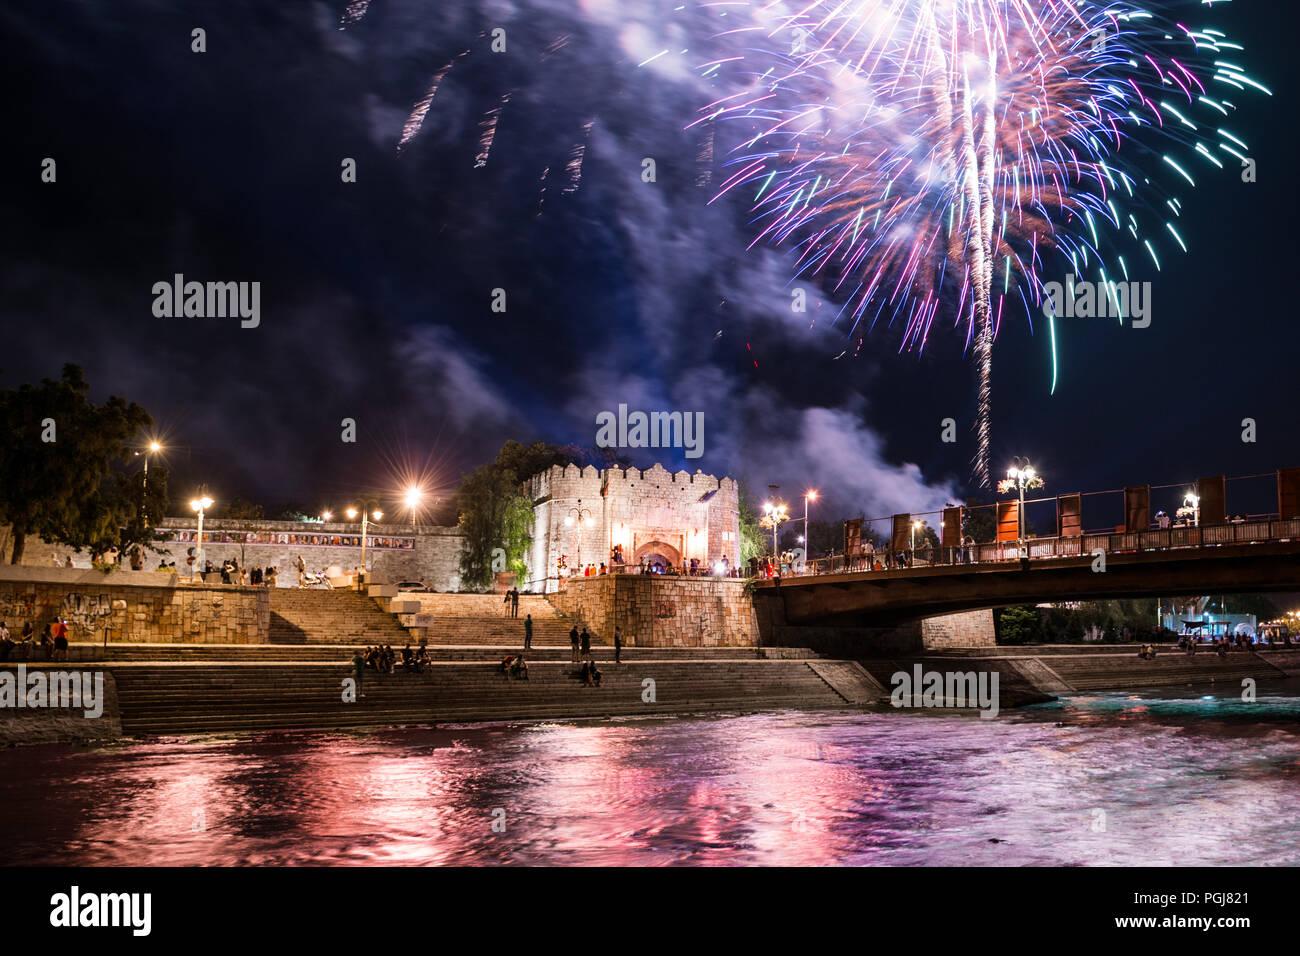 nis-serbia-august-25-2018-summer-firewor